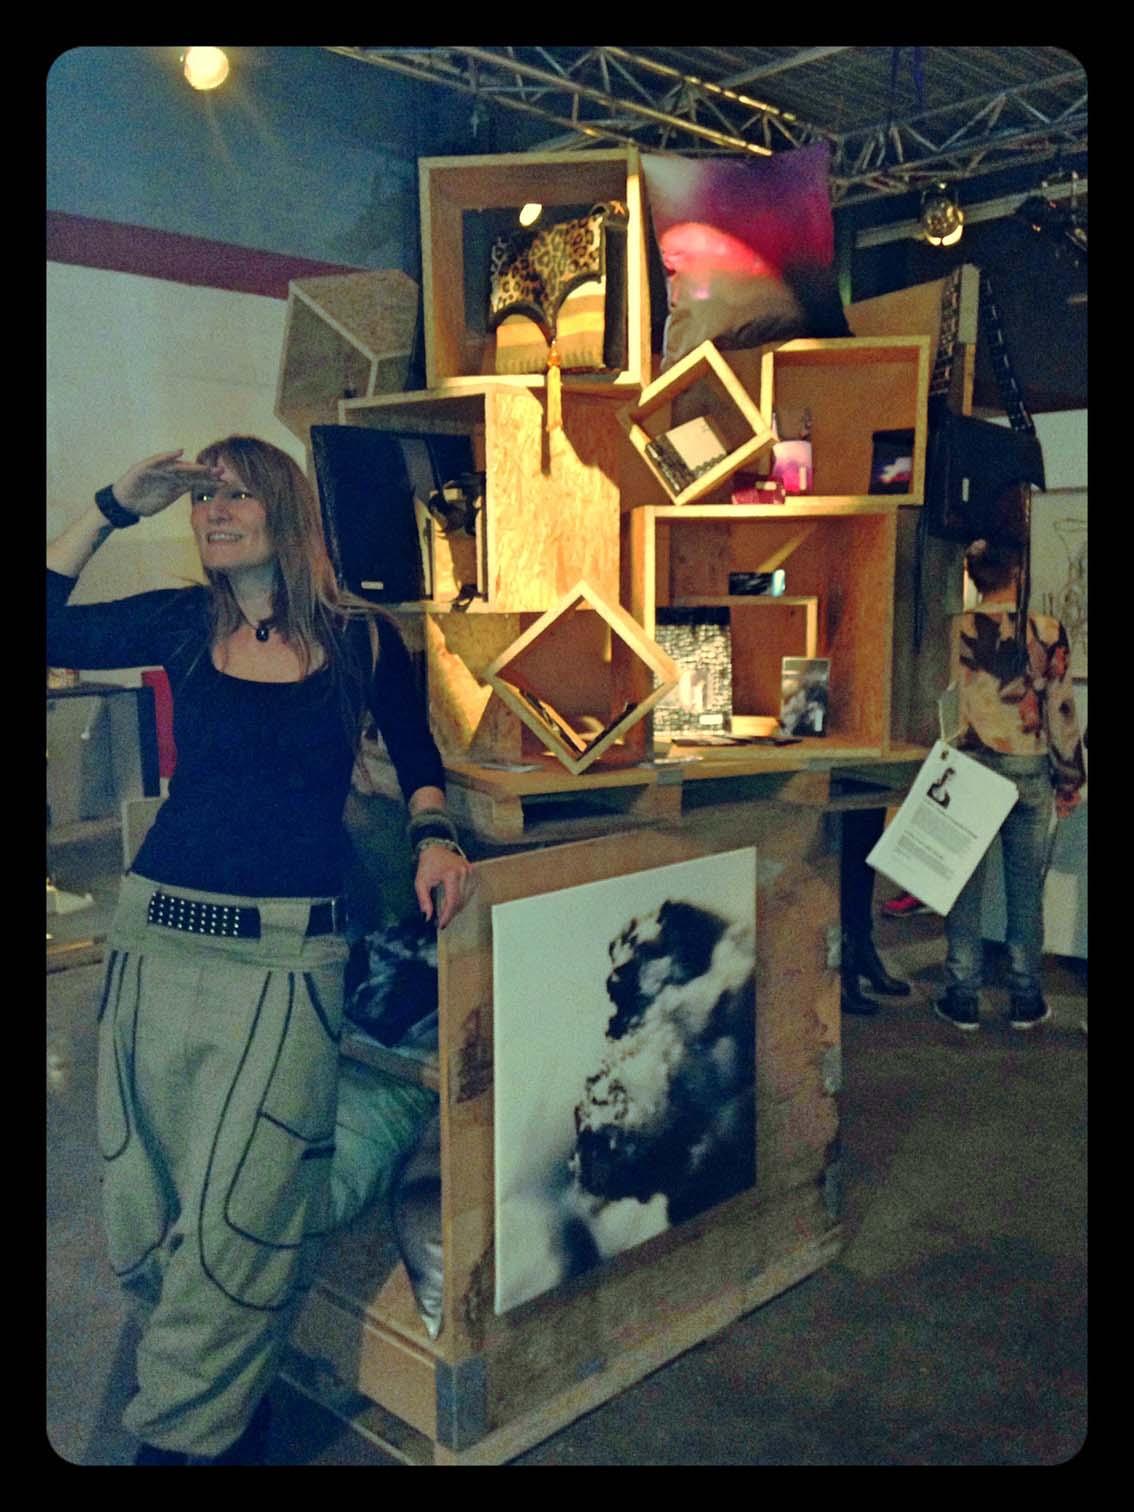 Sirella @ LaSirel_Art_Expo_Toegepaste fotografie